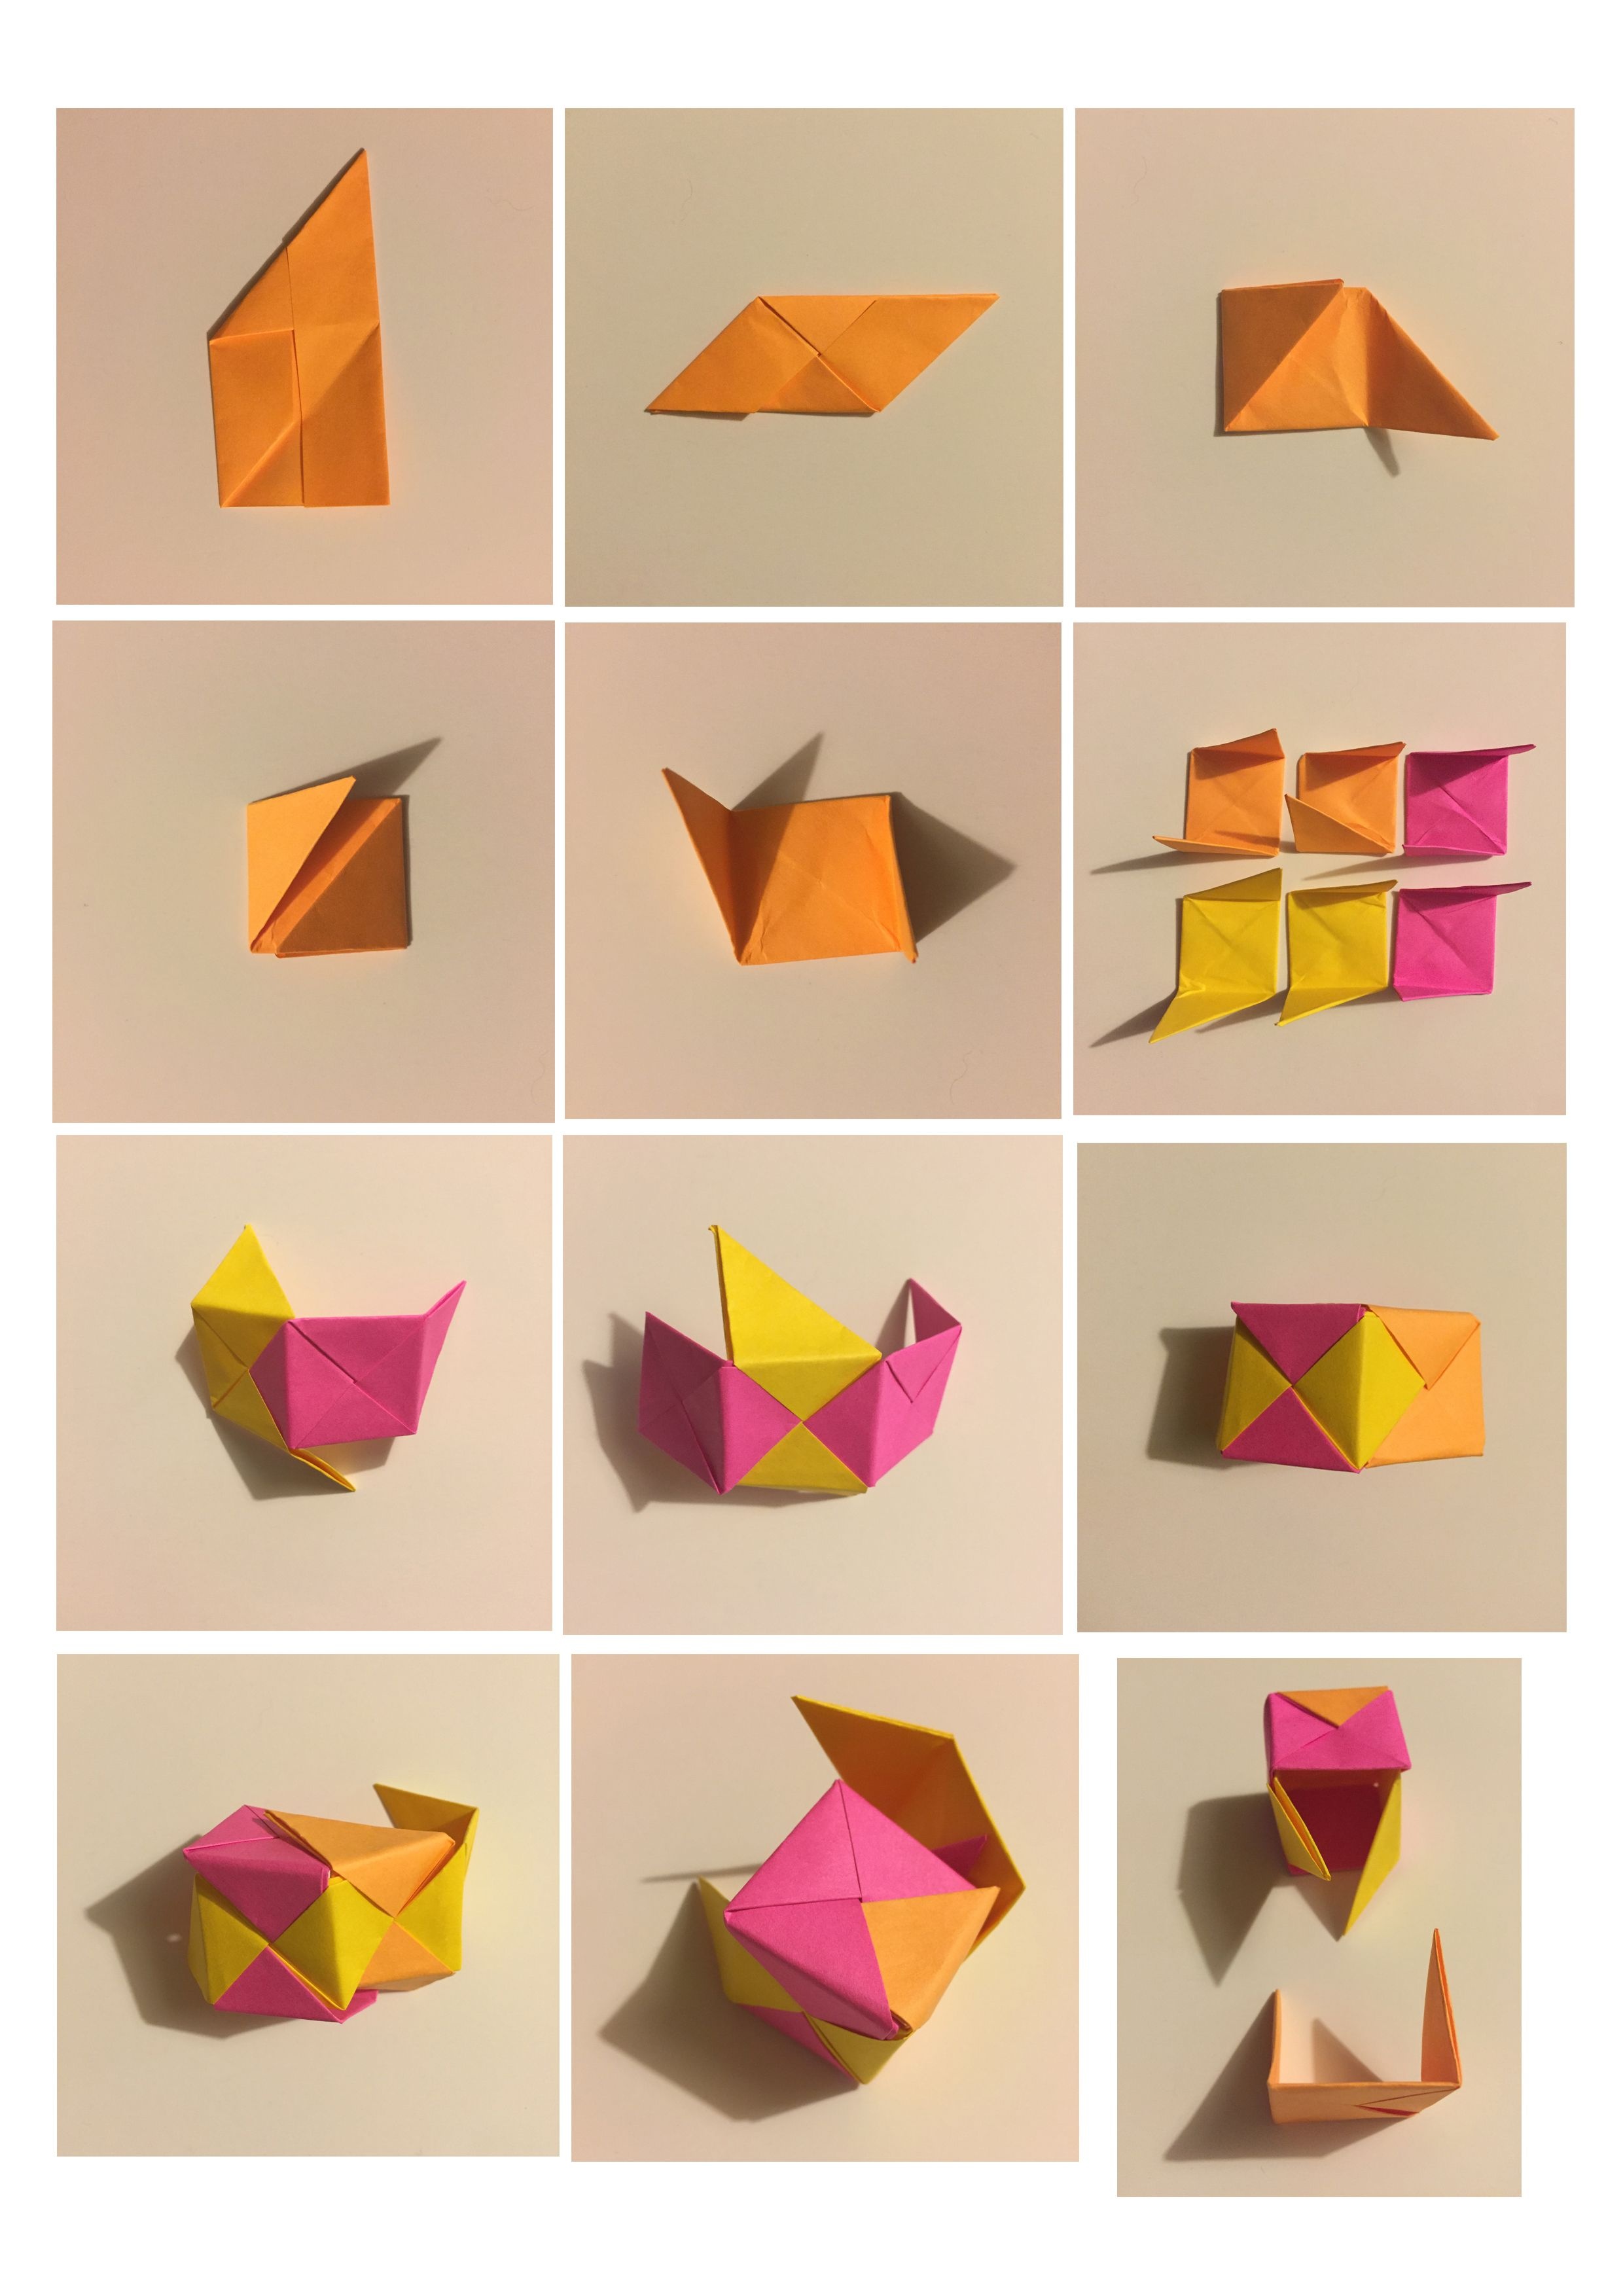 Cube Origami Step 2